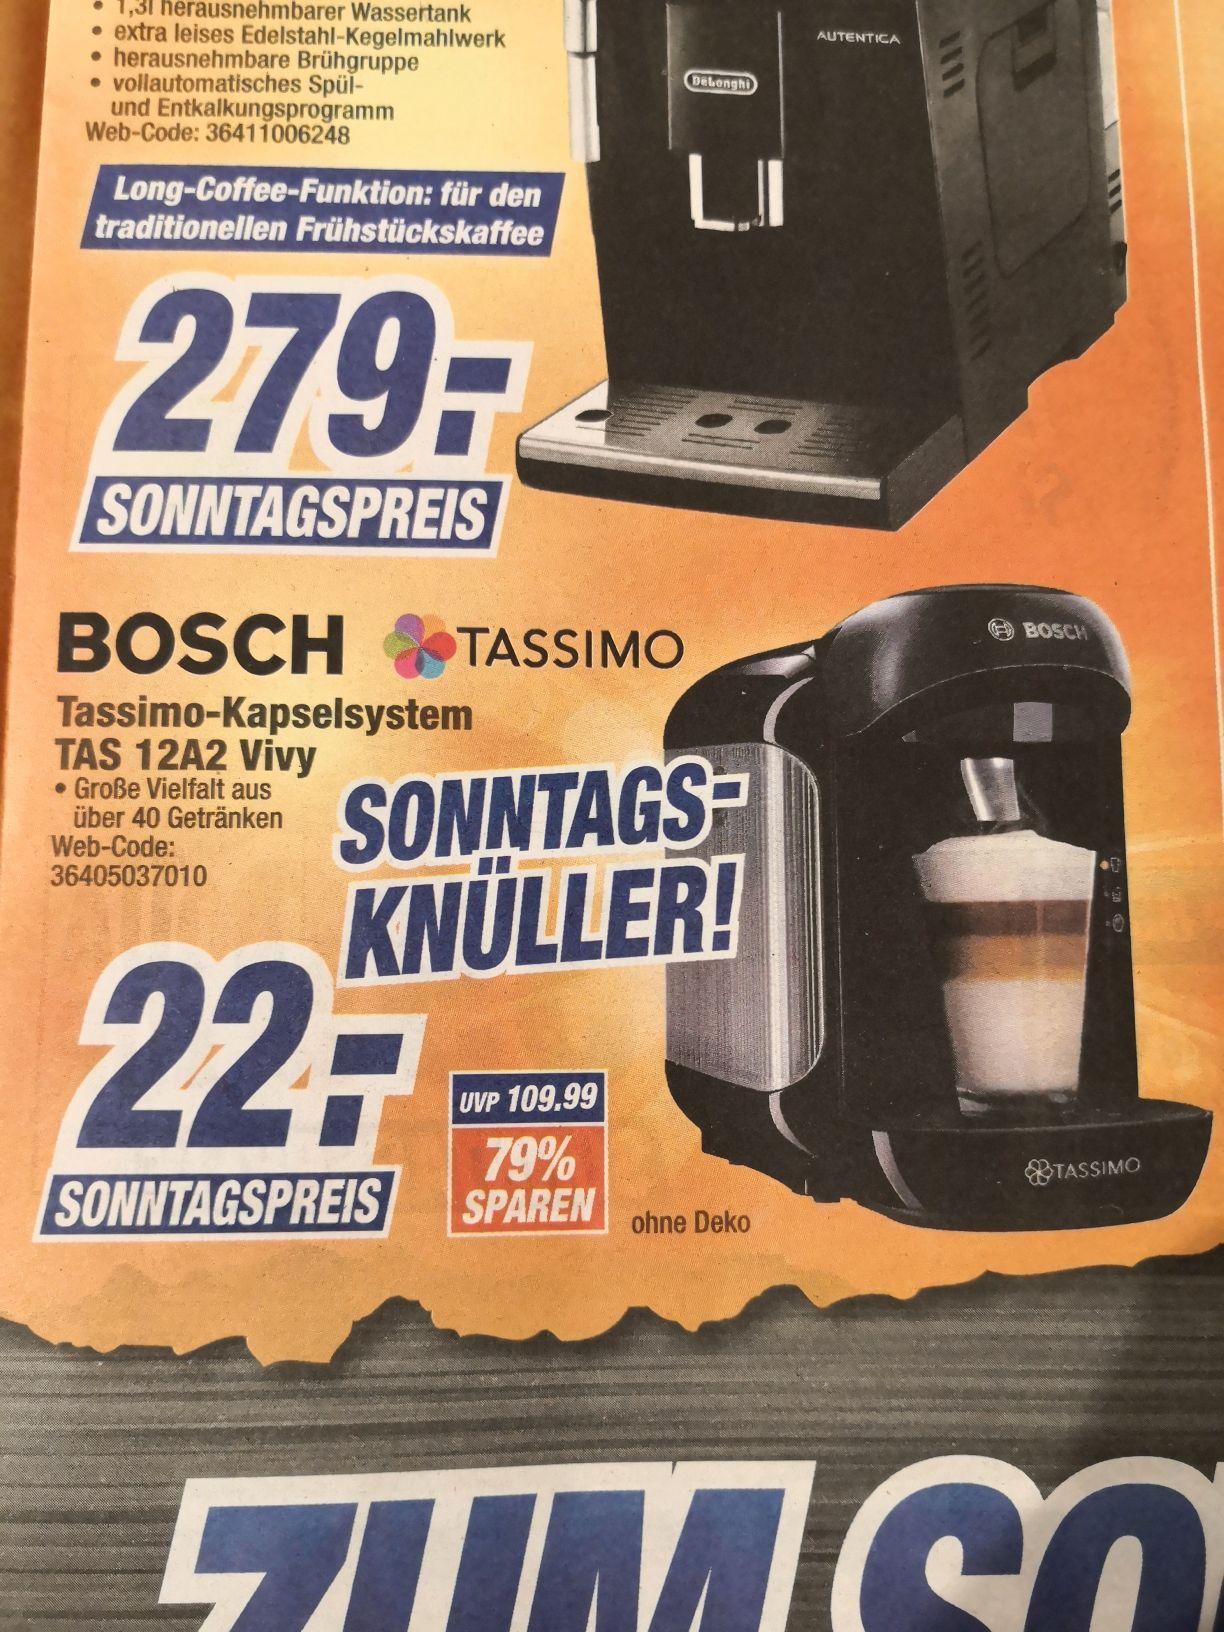 Machine à café Bosch Tassimo TAS12A2 - à Octomedia (Bühl - Frontaliers Allemagne)